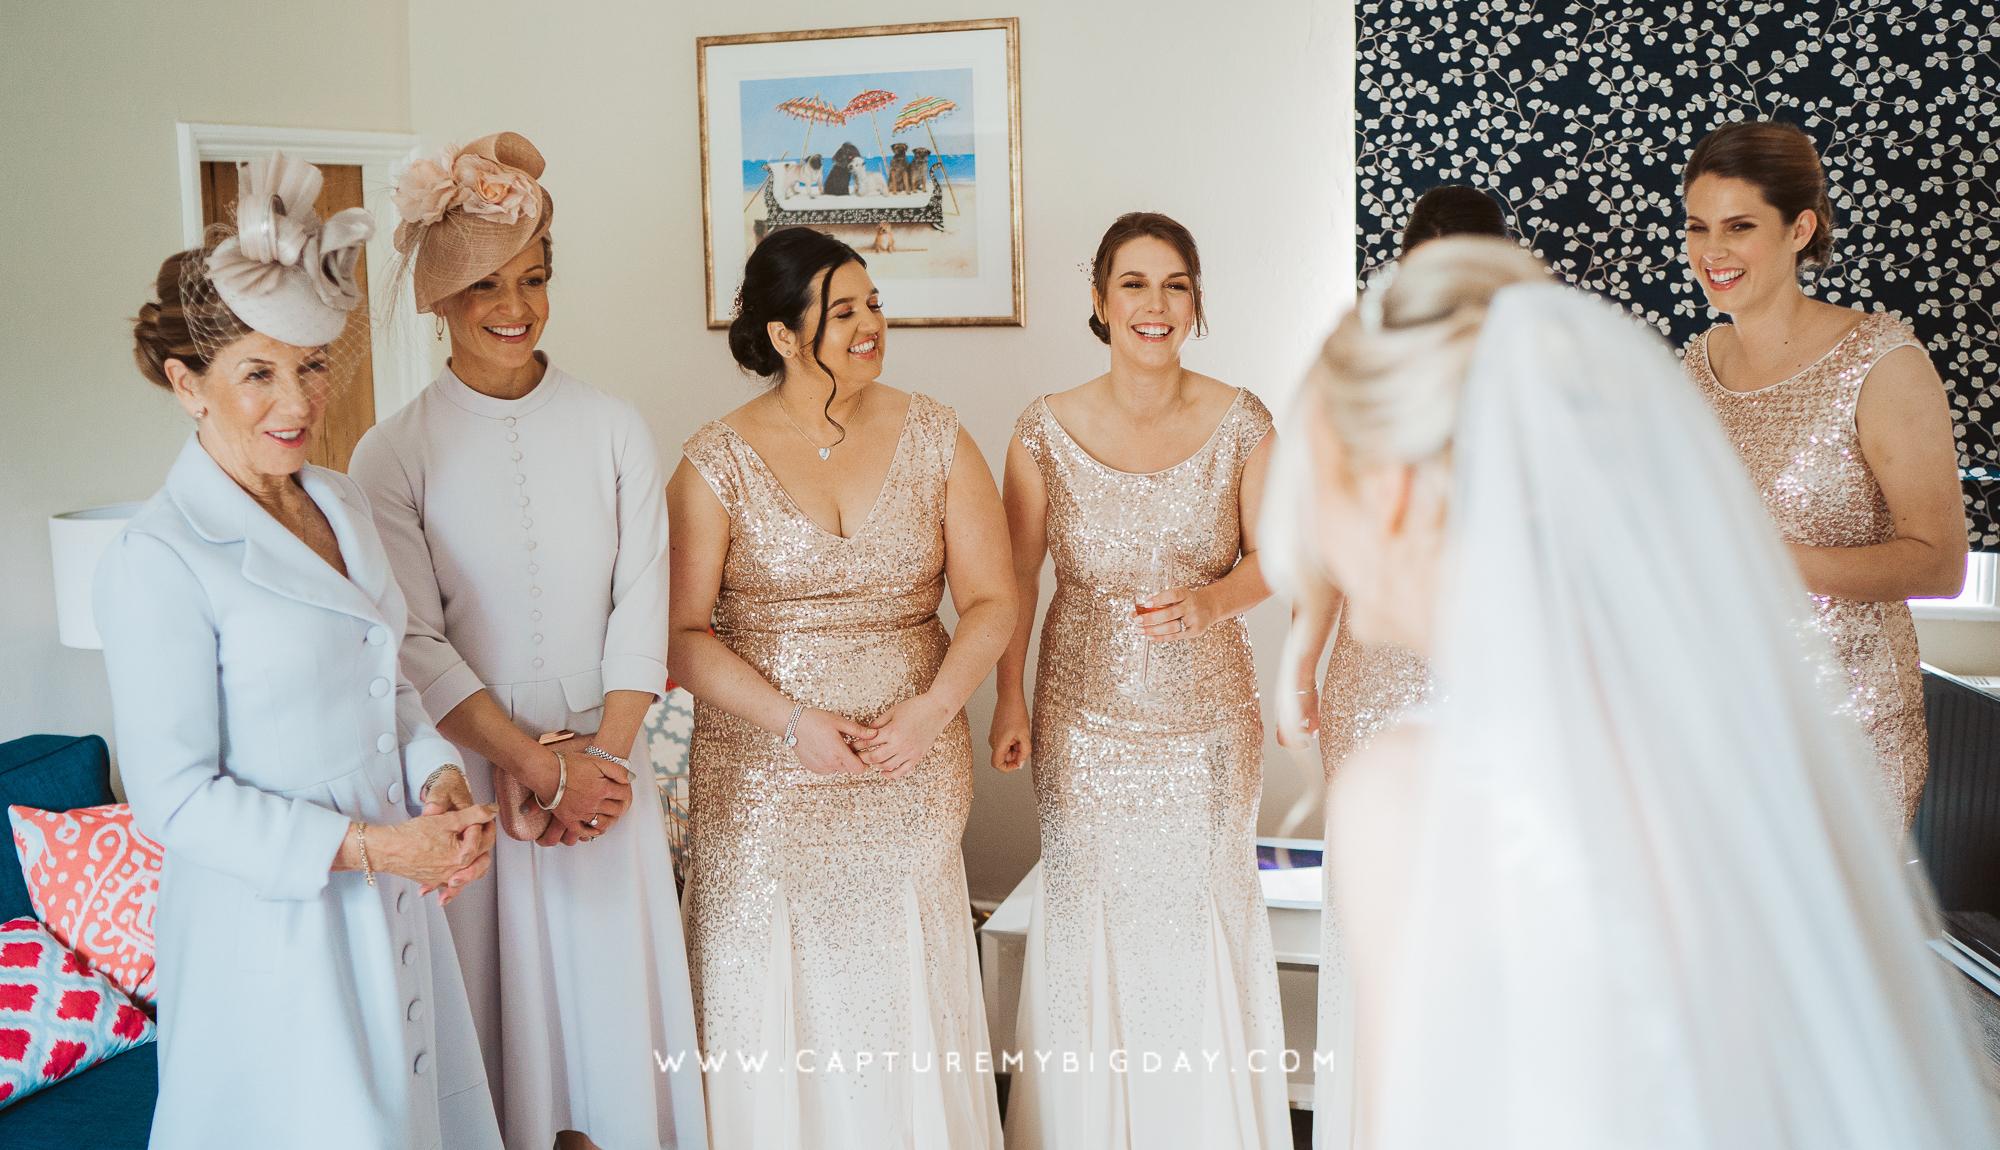 Bride revealing her dress to Bridesmaids